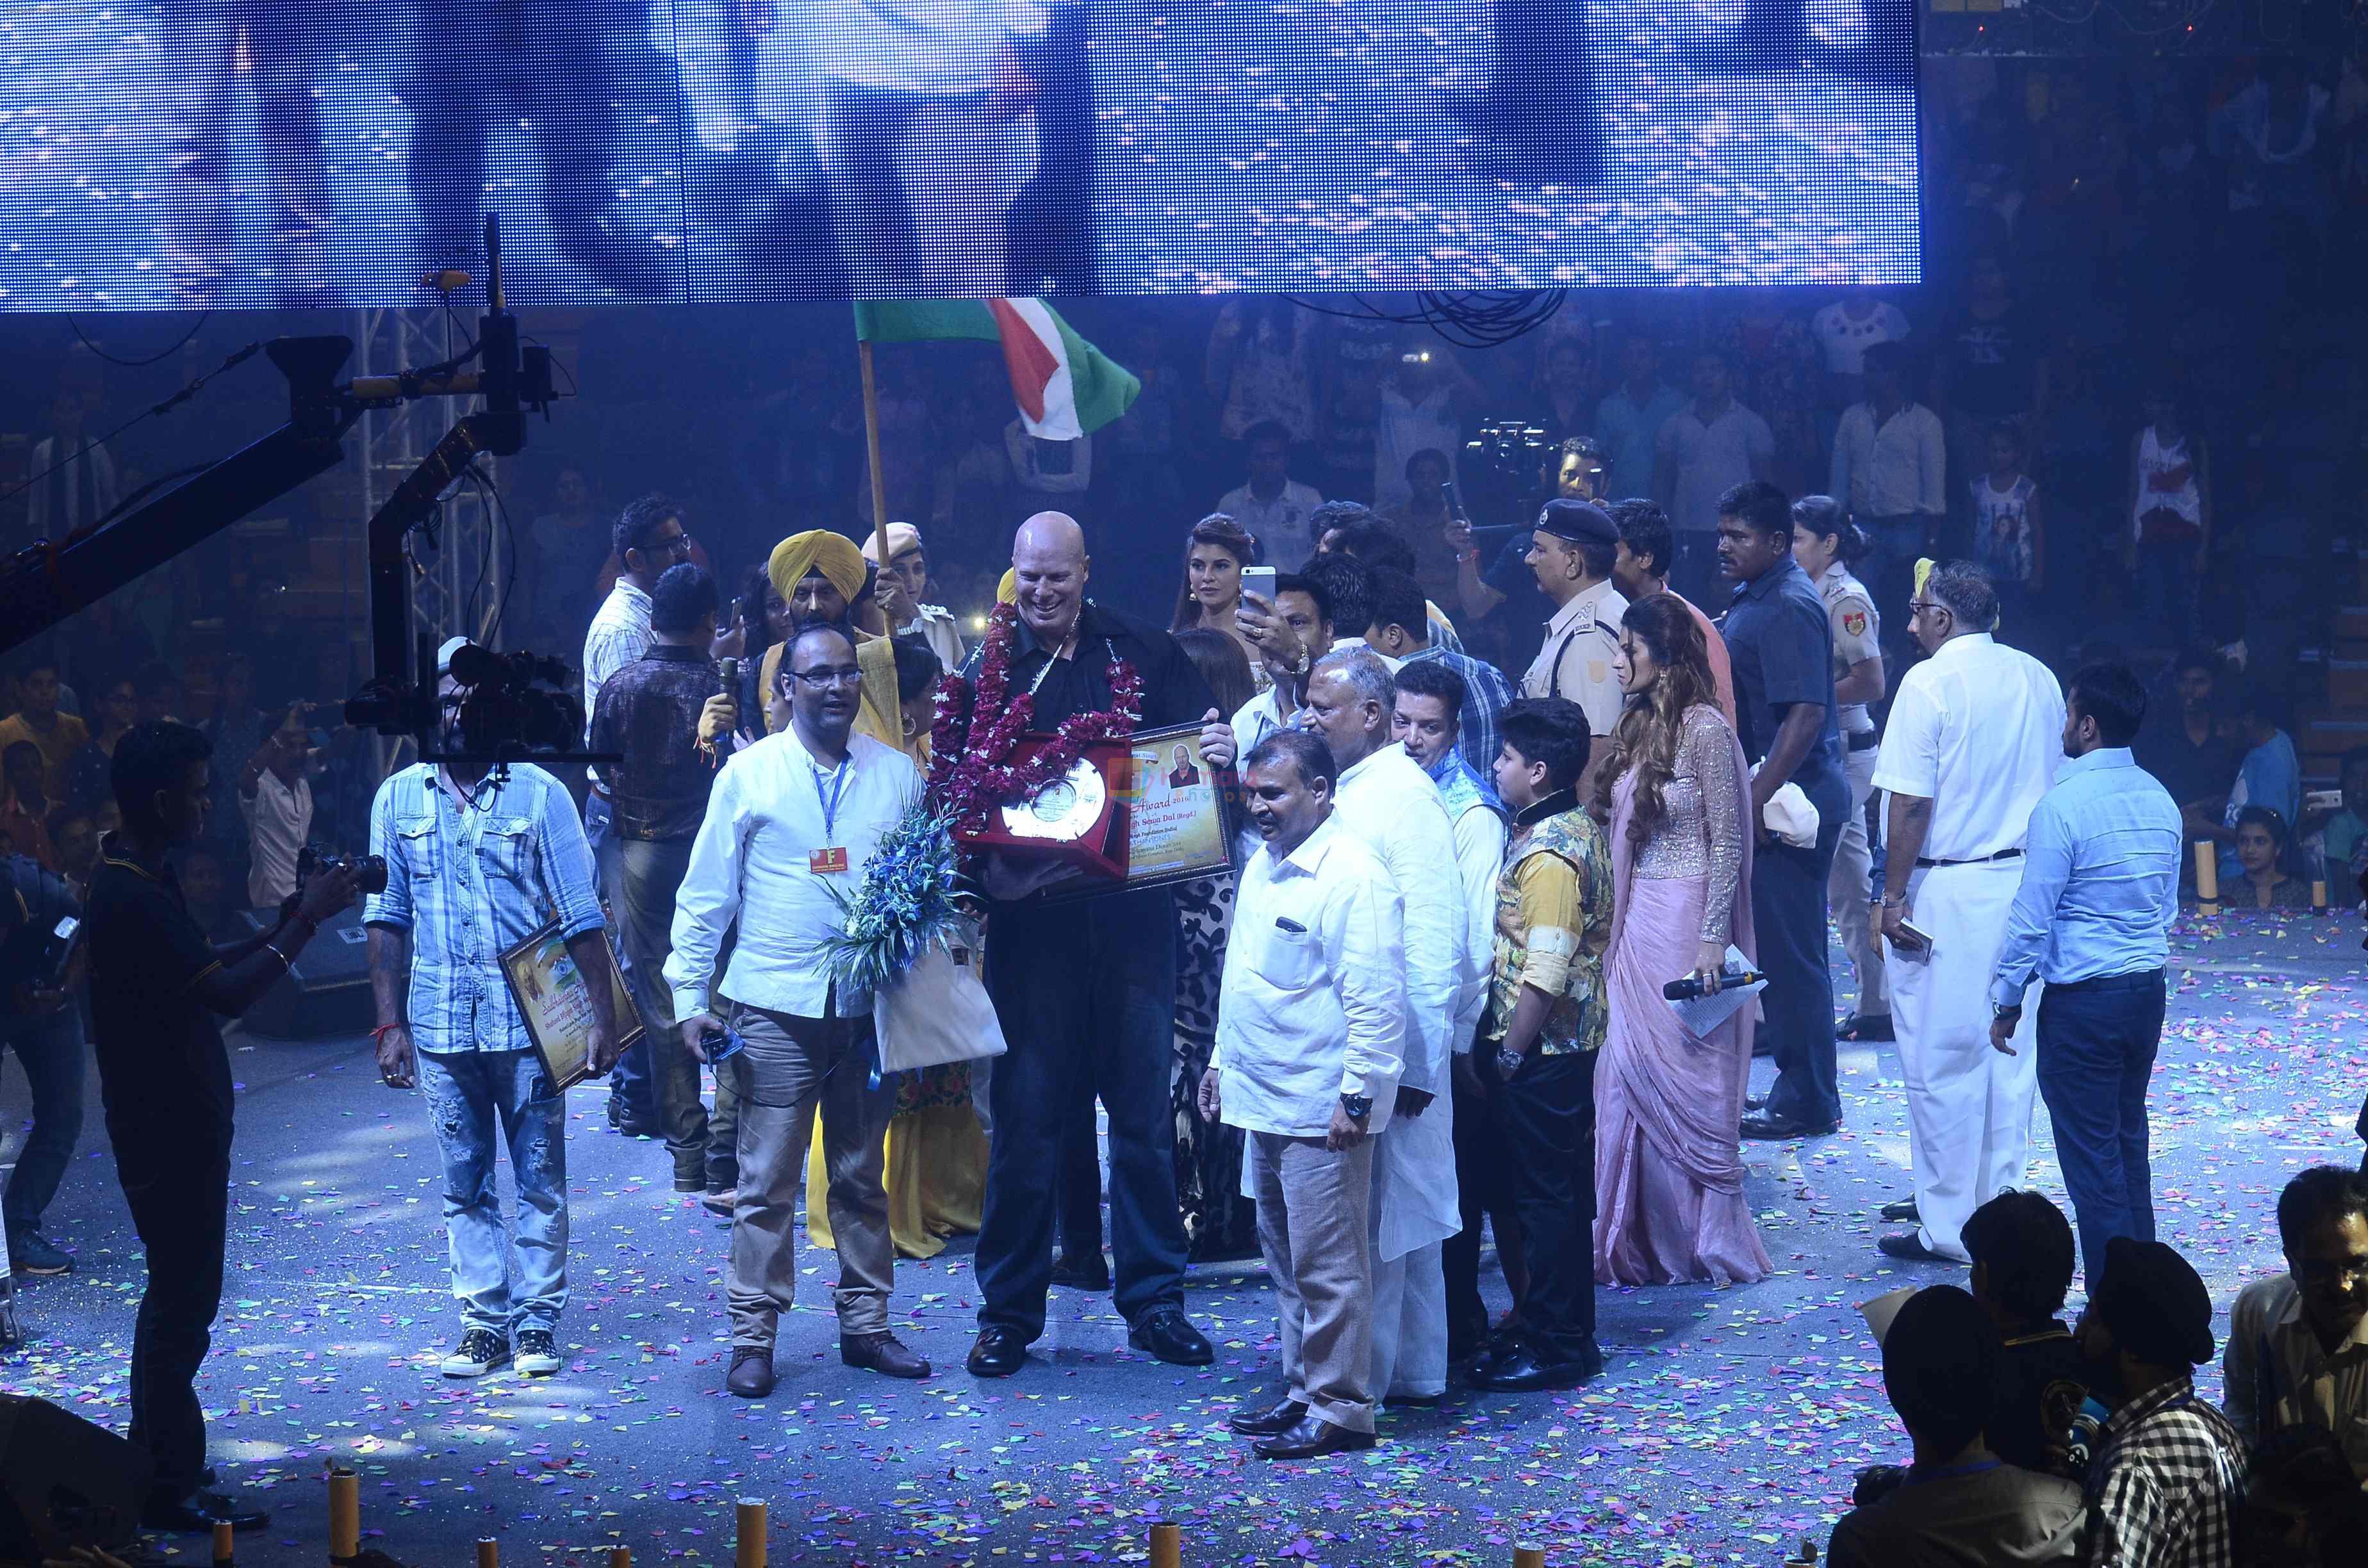 Tiger Shroff, Jacqueline Fernandez, Remo D Souza promote The Flying Jatt in Bhagat Singh Sadbhavana on 21st Aug 2016